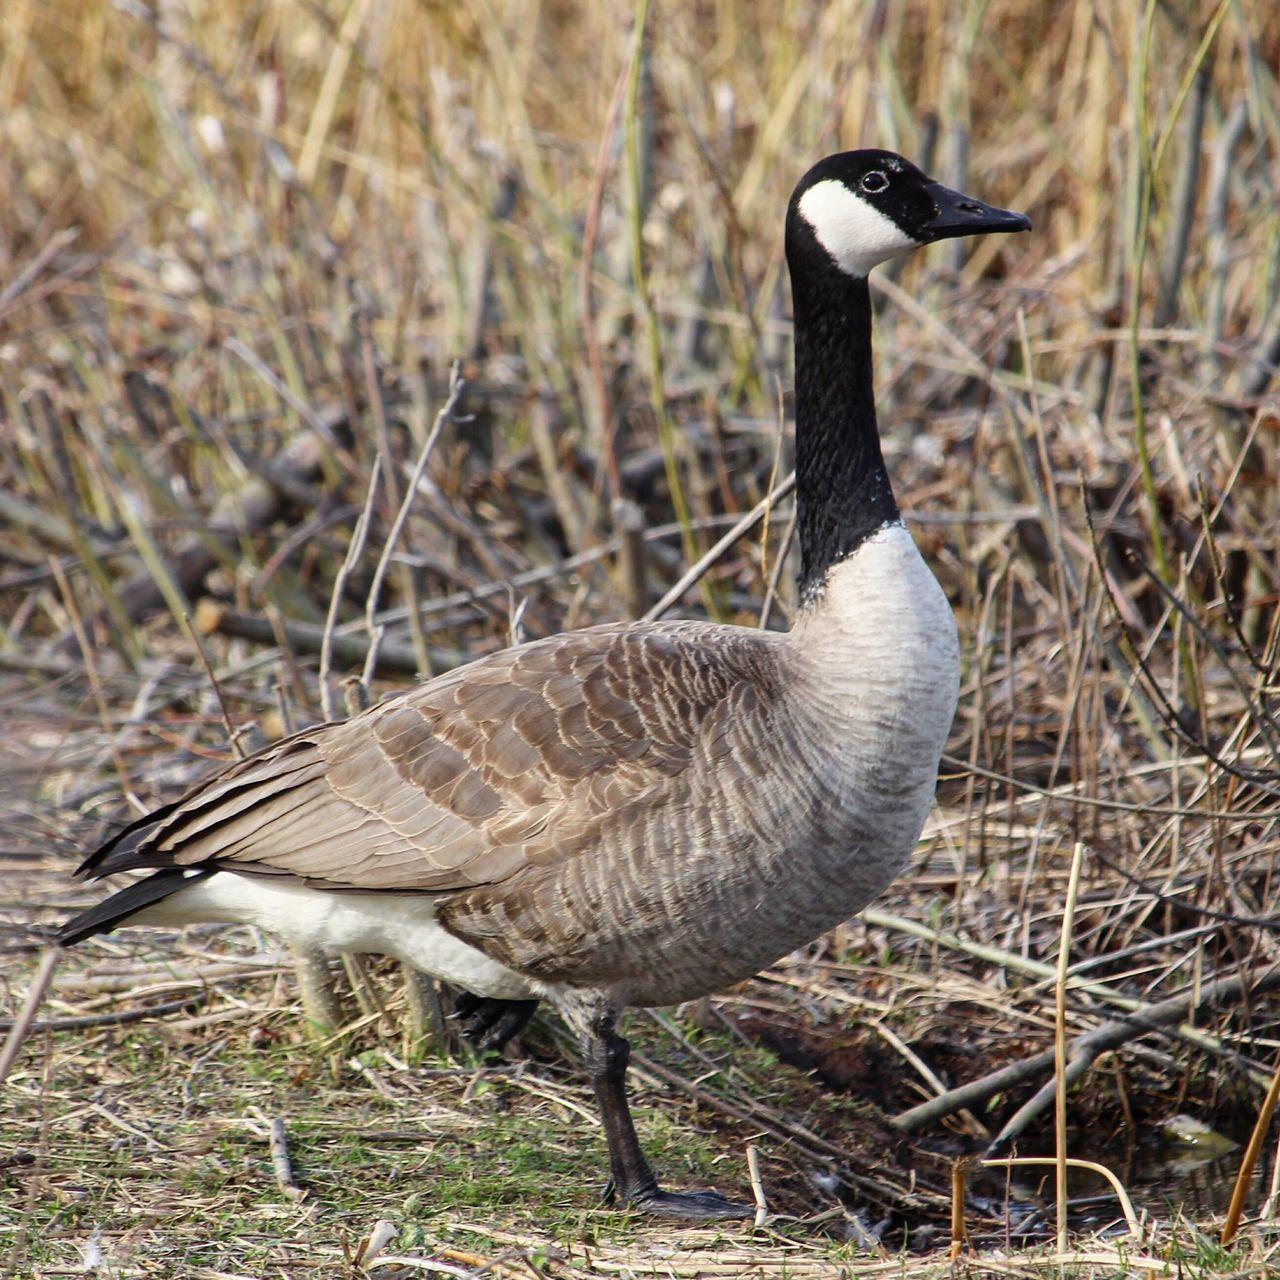 animals in the wild, bird, animal themes, one animal, animal wildlife, field, day, goose, nature, gosling, outdoors, water bird, no people, grass